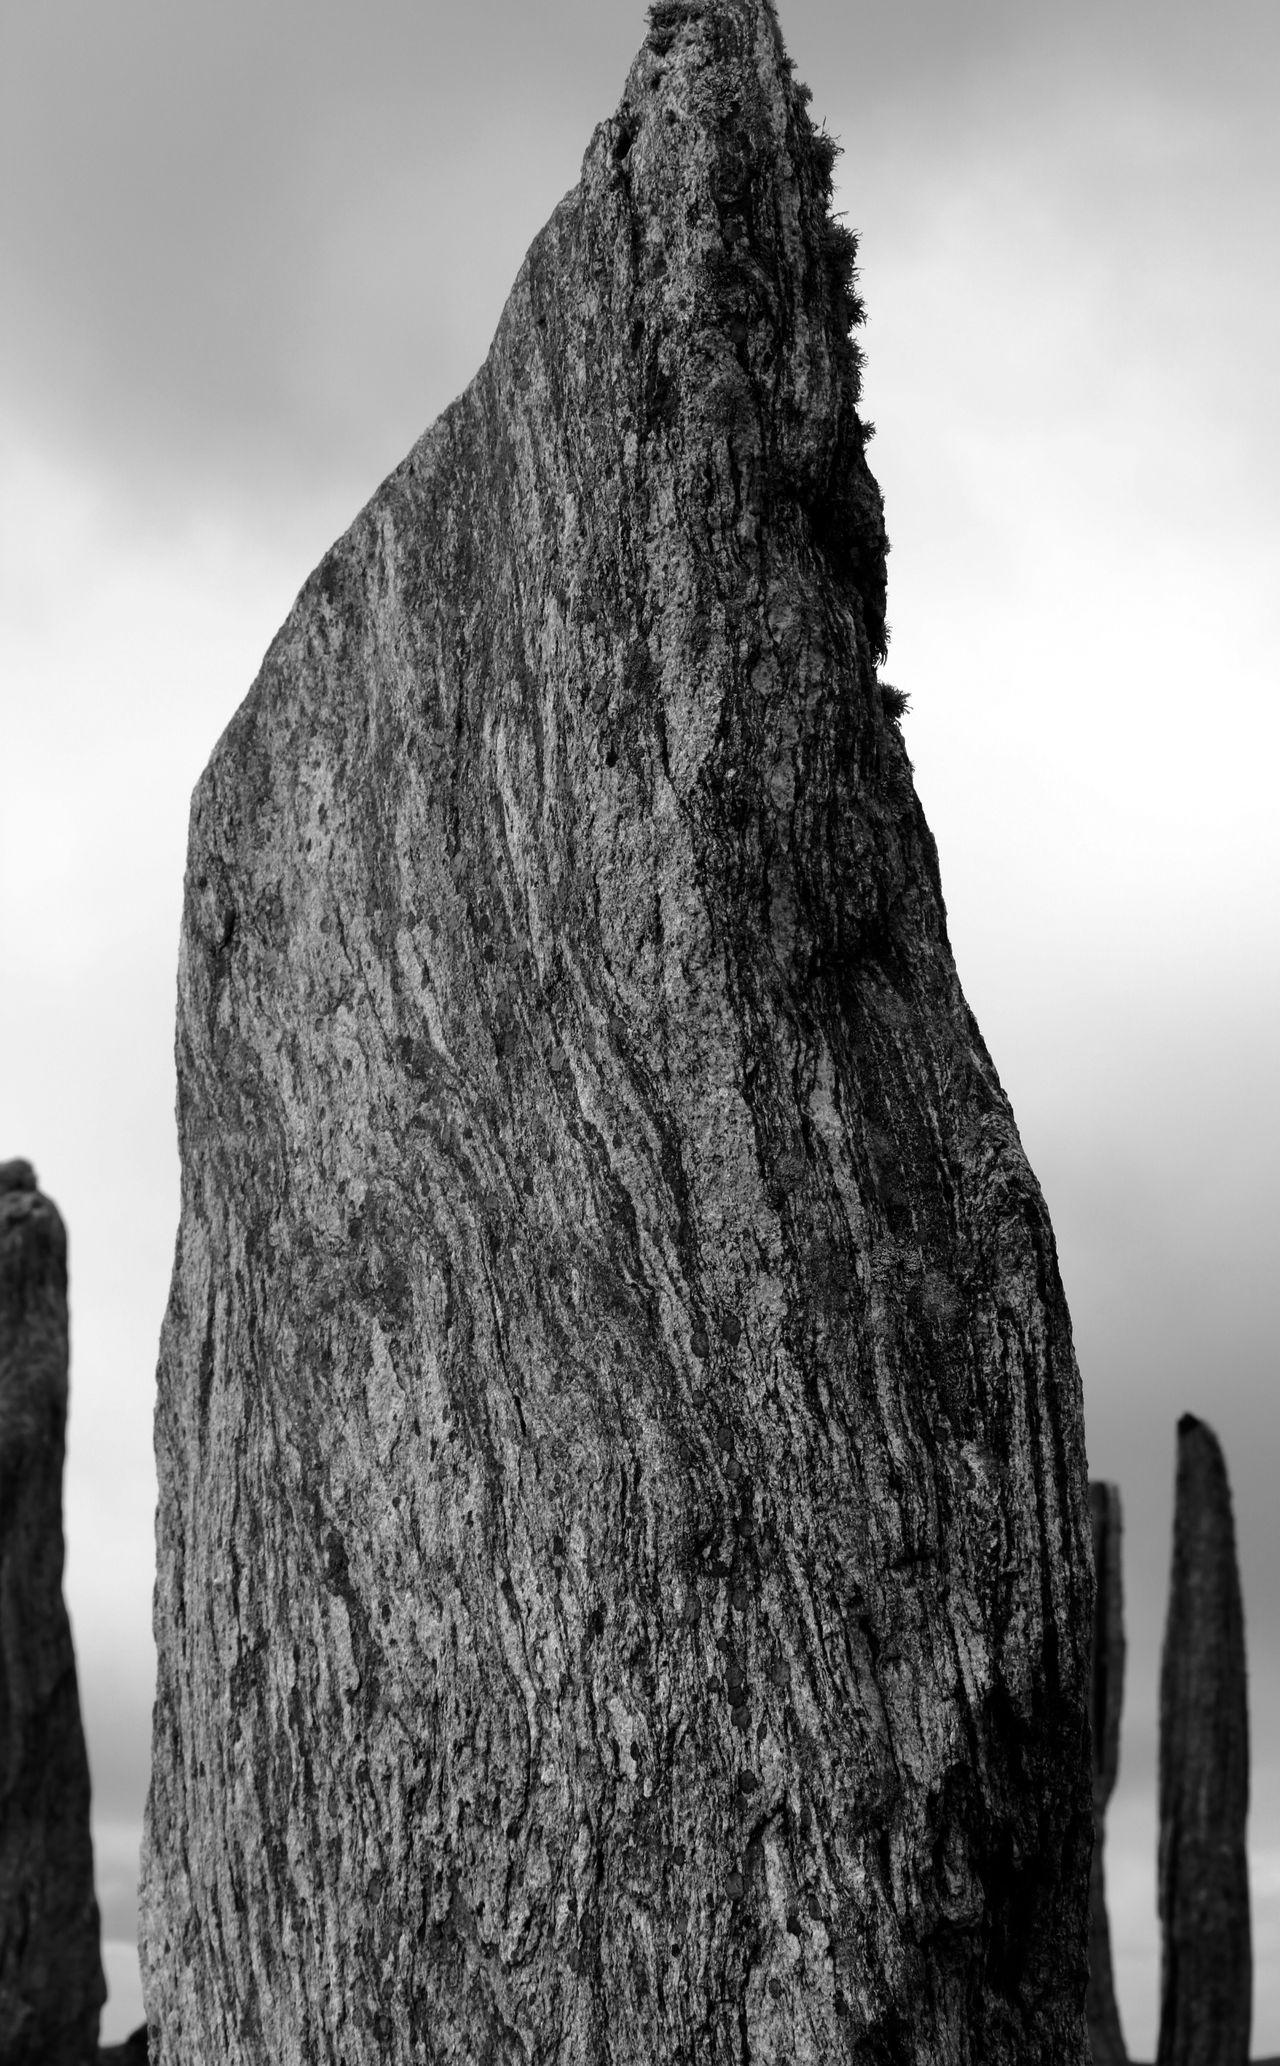 The Struggle of History Beauty In Nature Blackandwhite Heritage Site History Scotland Scotlandsbeauty Standing Stones Stone Stones